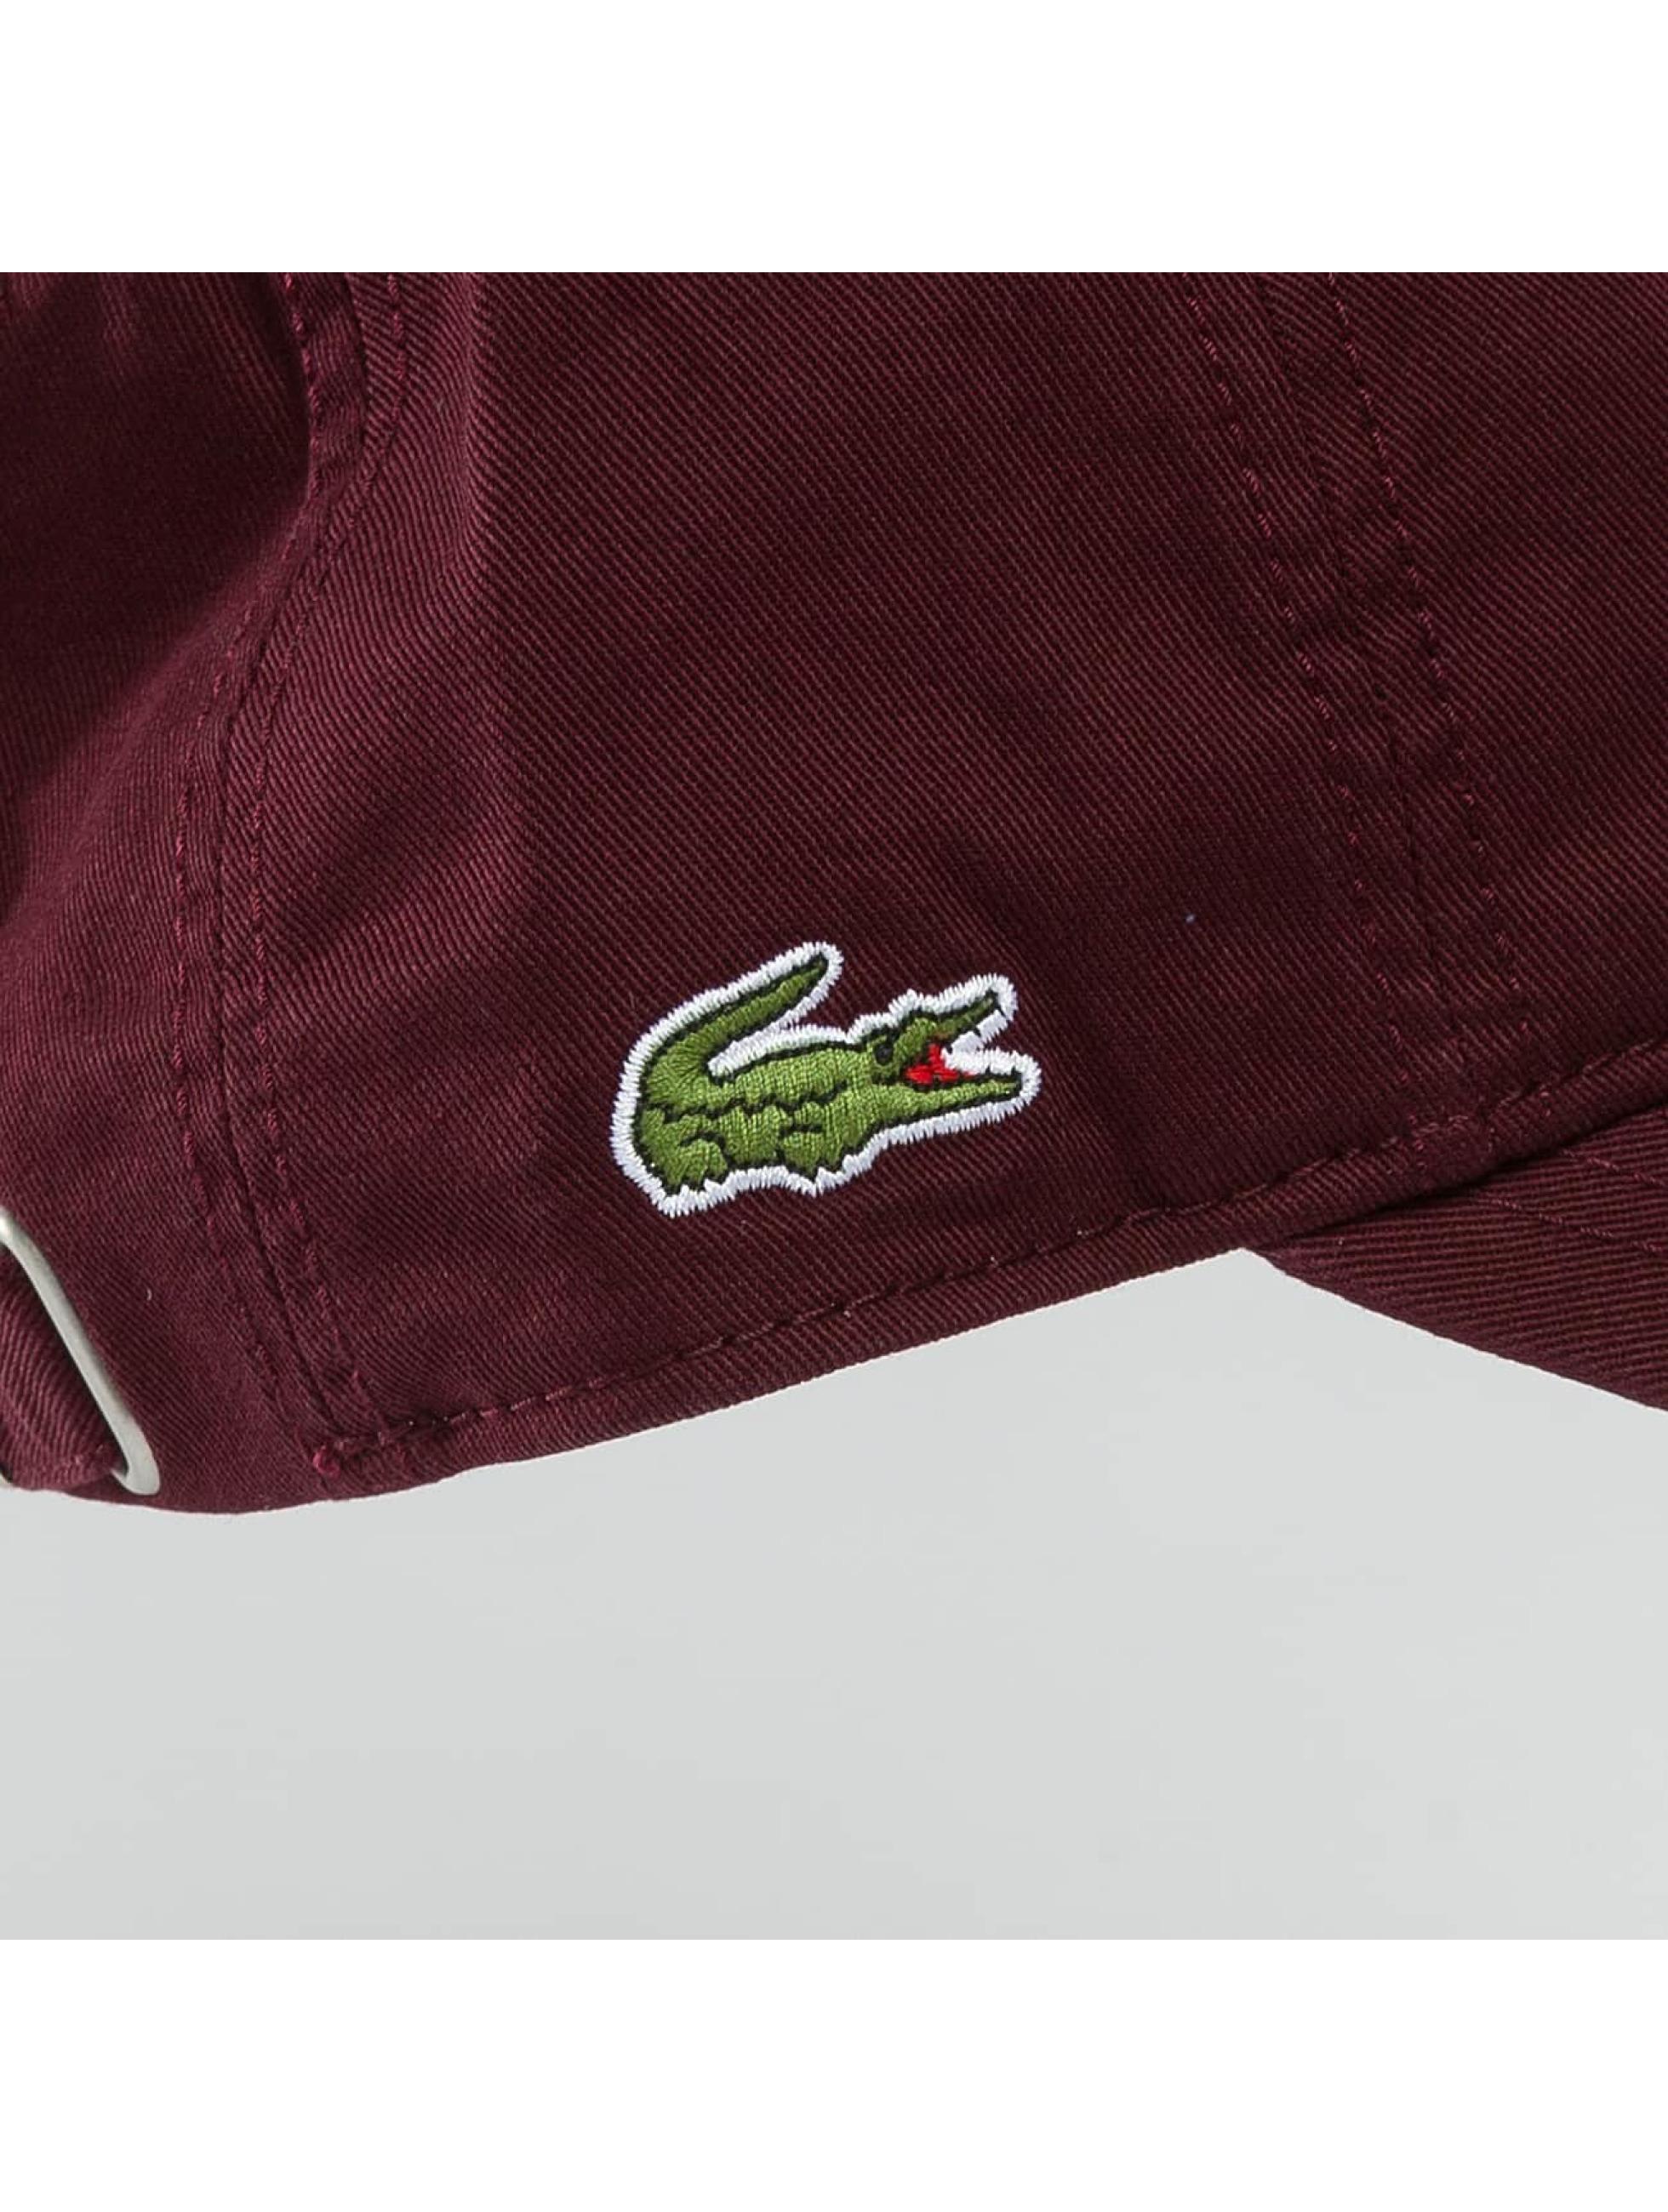 Lacoste Snapback Cap Gabardine Croc purple